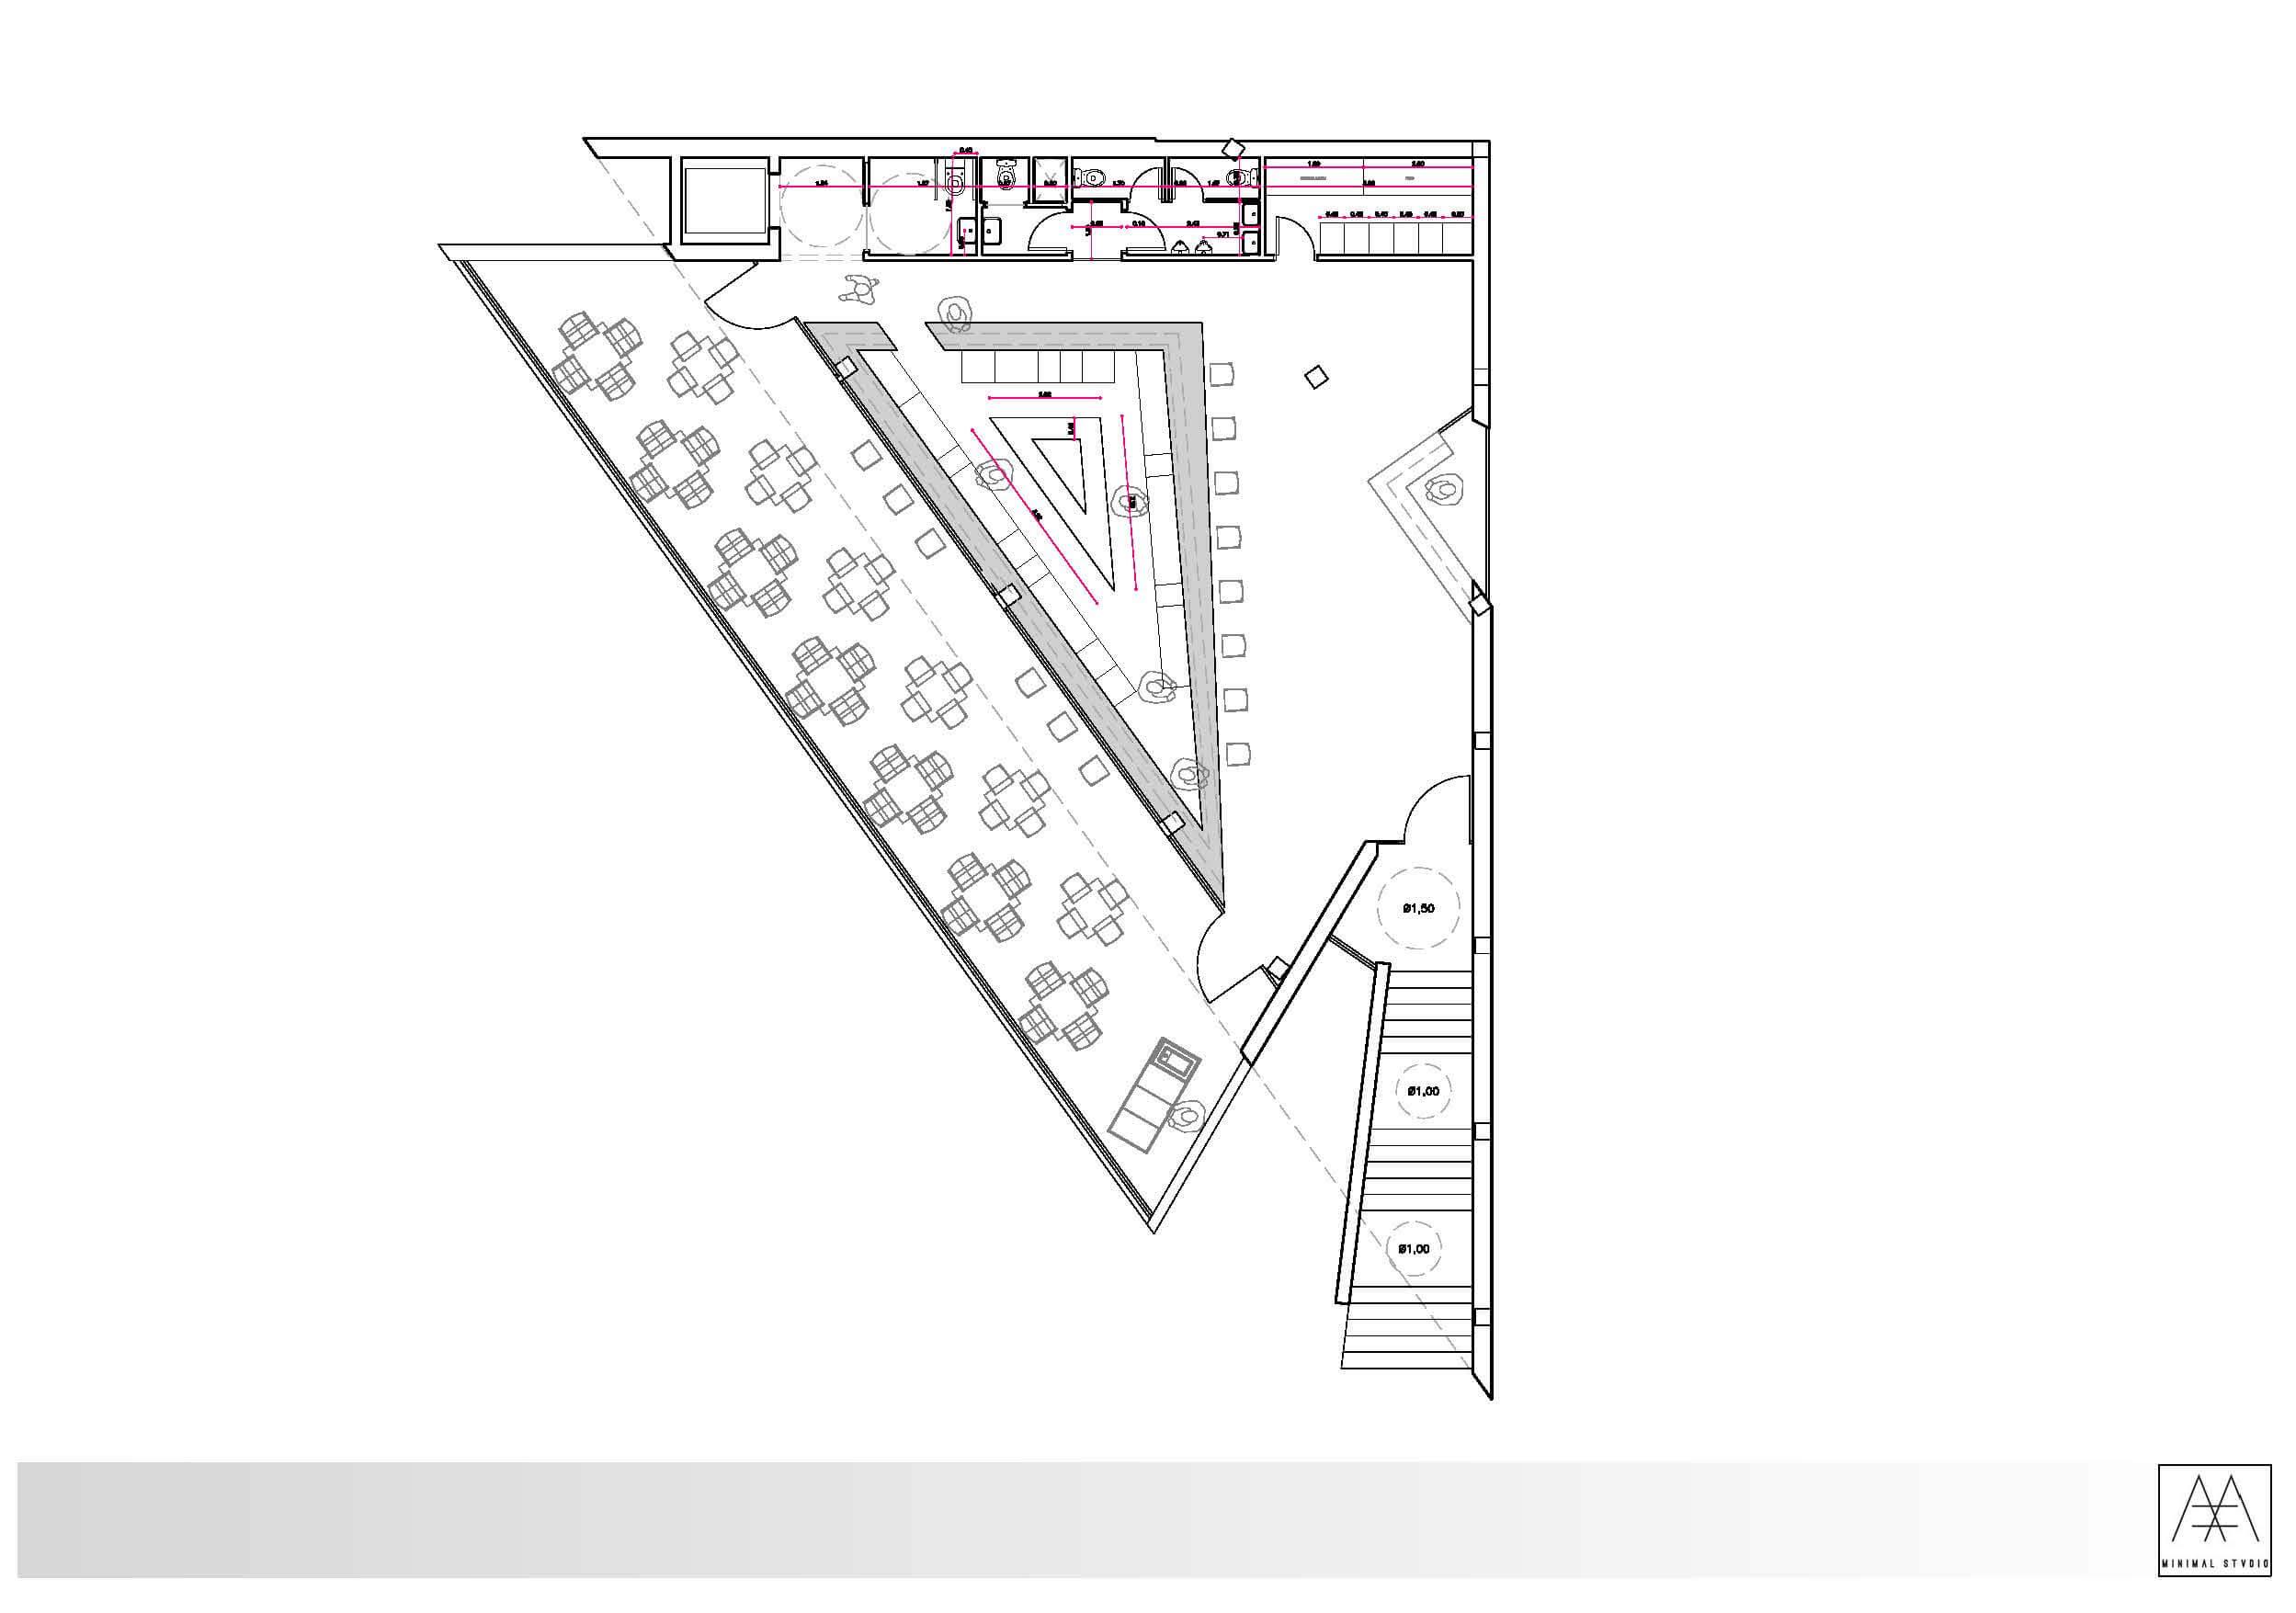 Uma proposta minimalista para o D3 Lounge